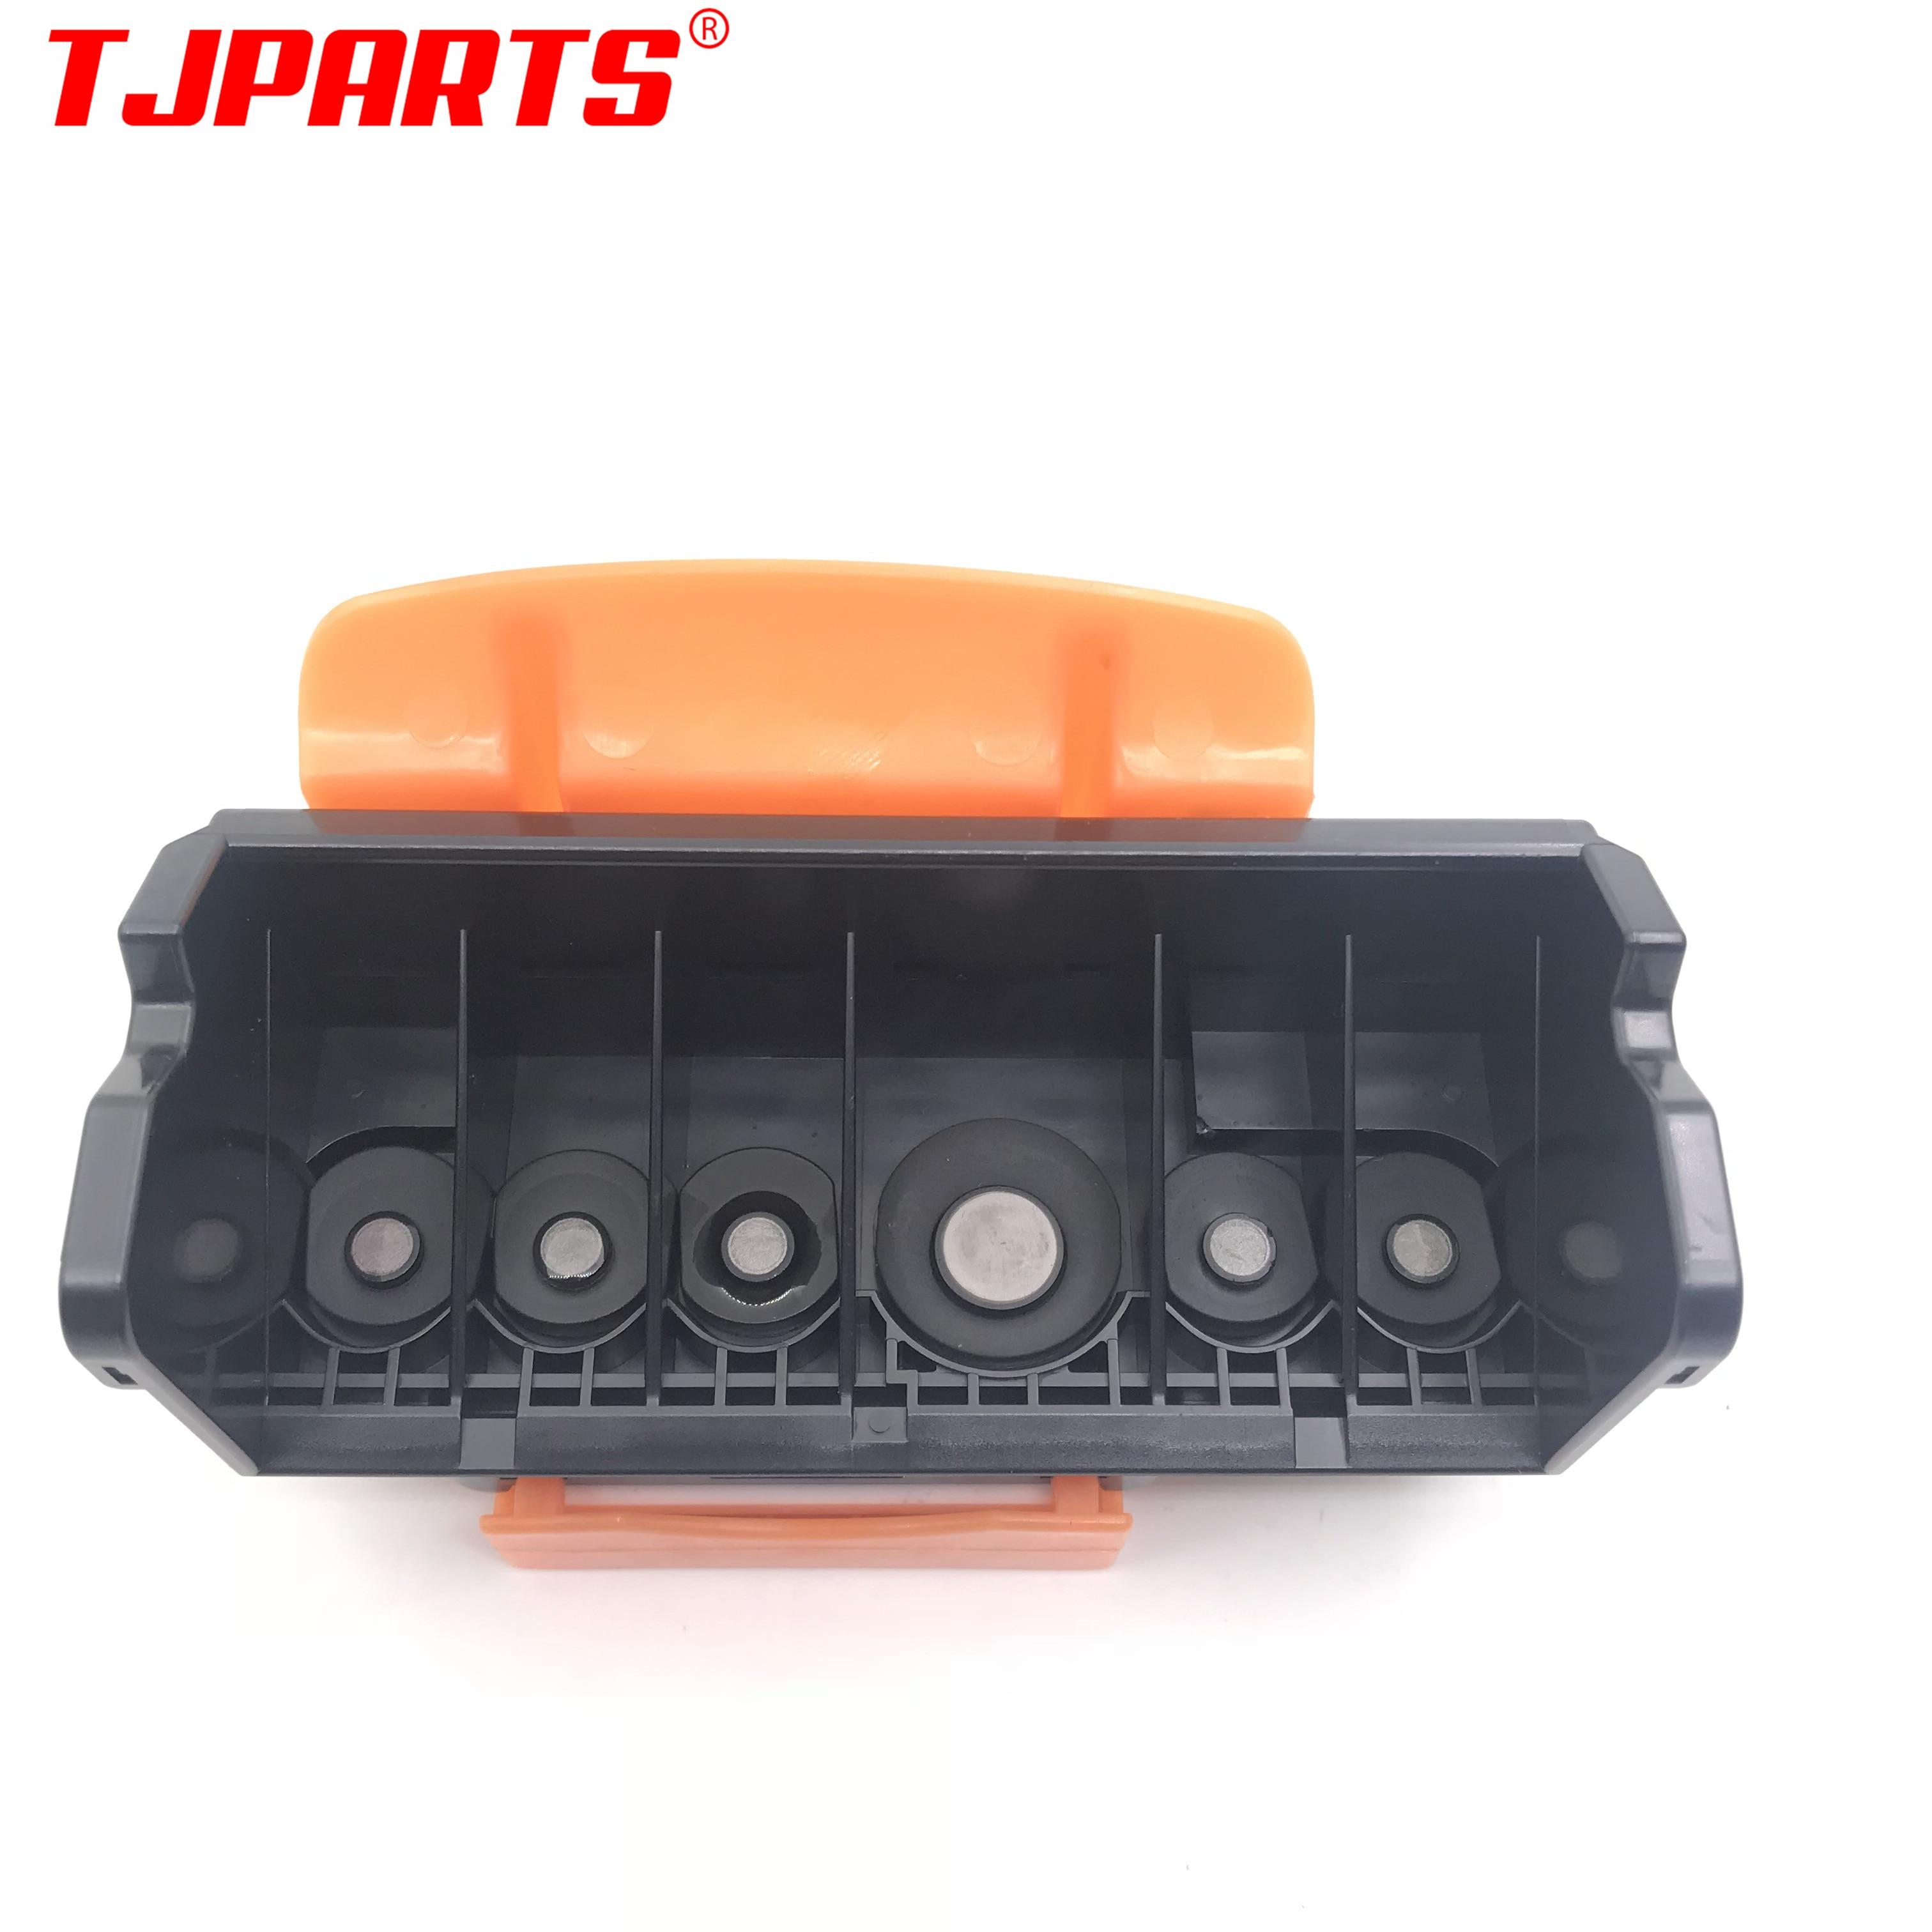 QY6-0078 QY6-0078-000 Printhead Printer Print Head for Canon MP990 MP996 MG6120 MG6140 MG6180 MG6280 MG8120 MG8180 MG8280 MG6250